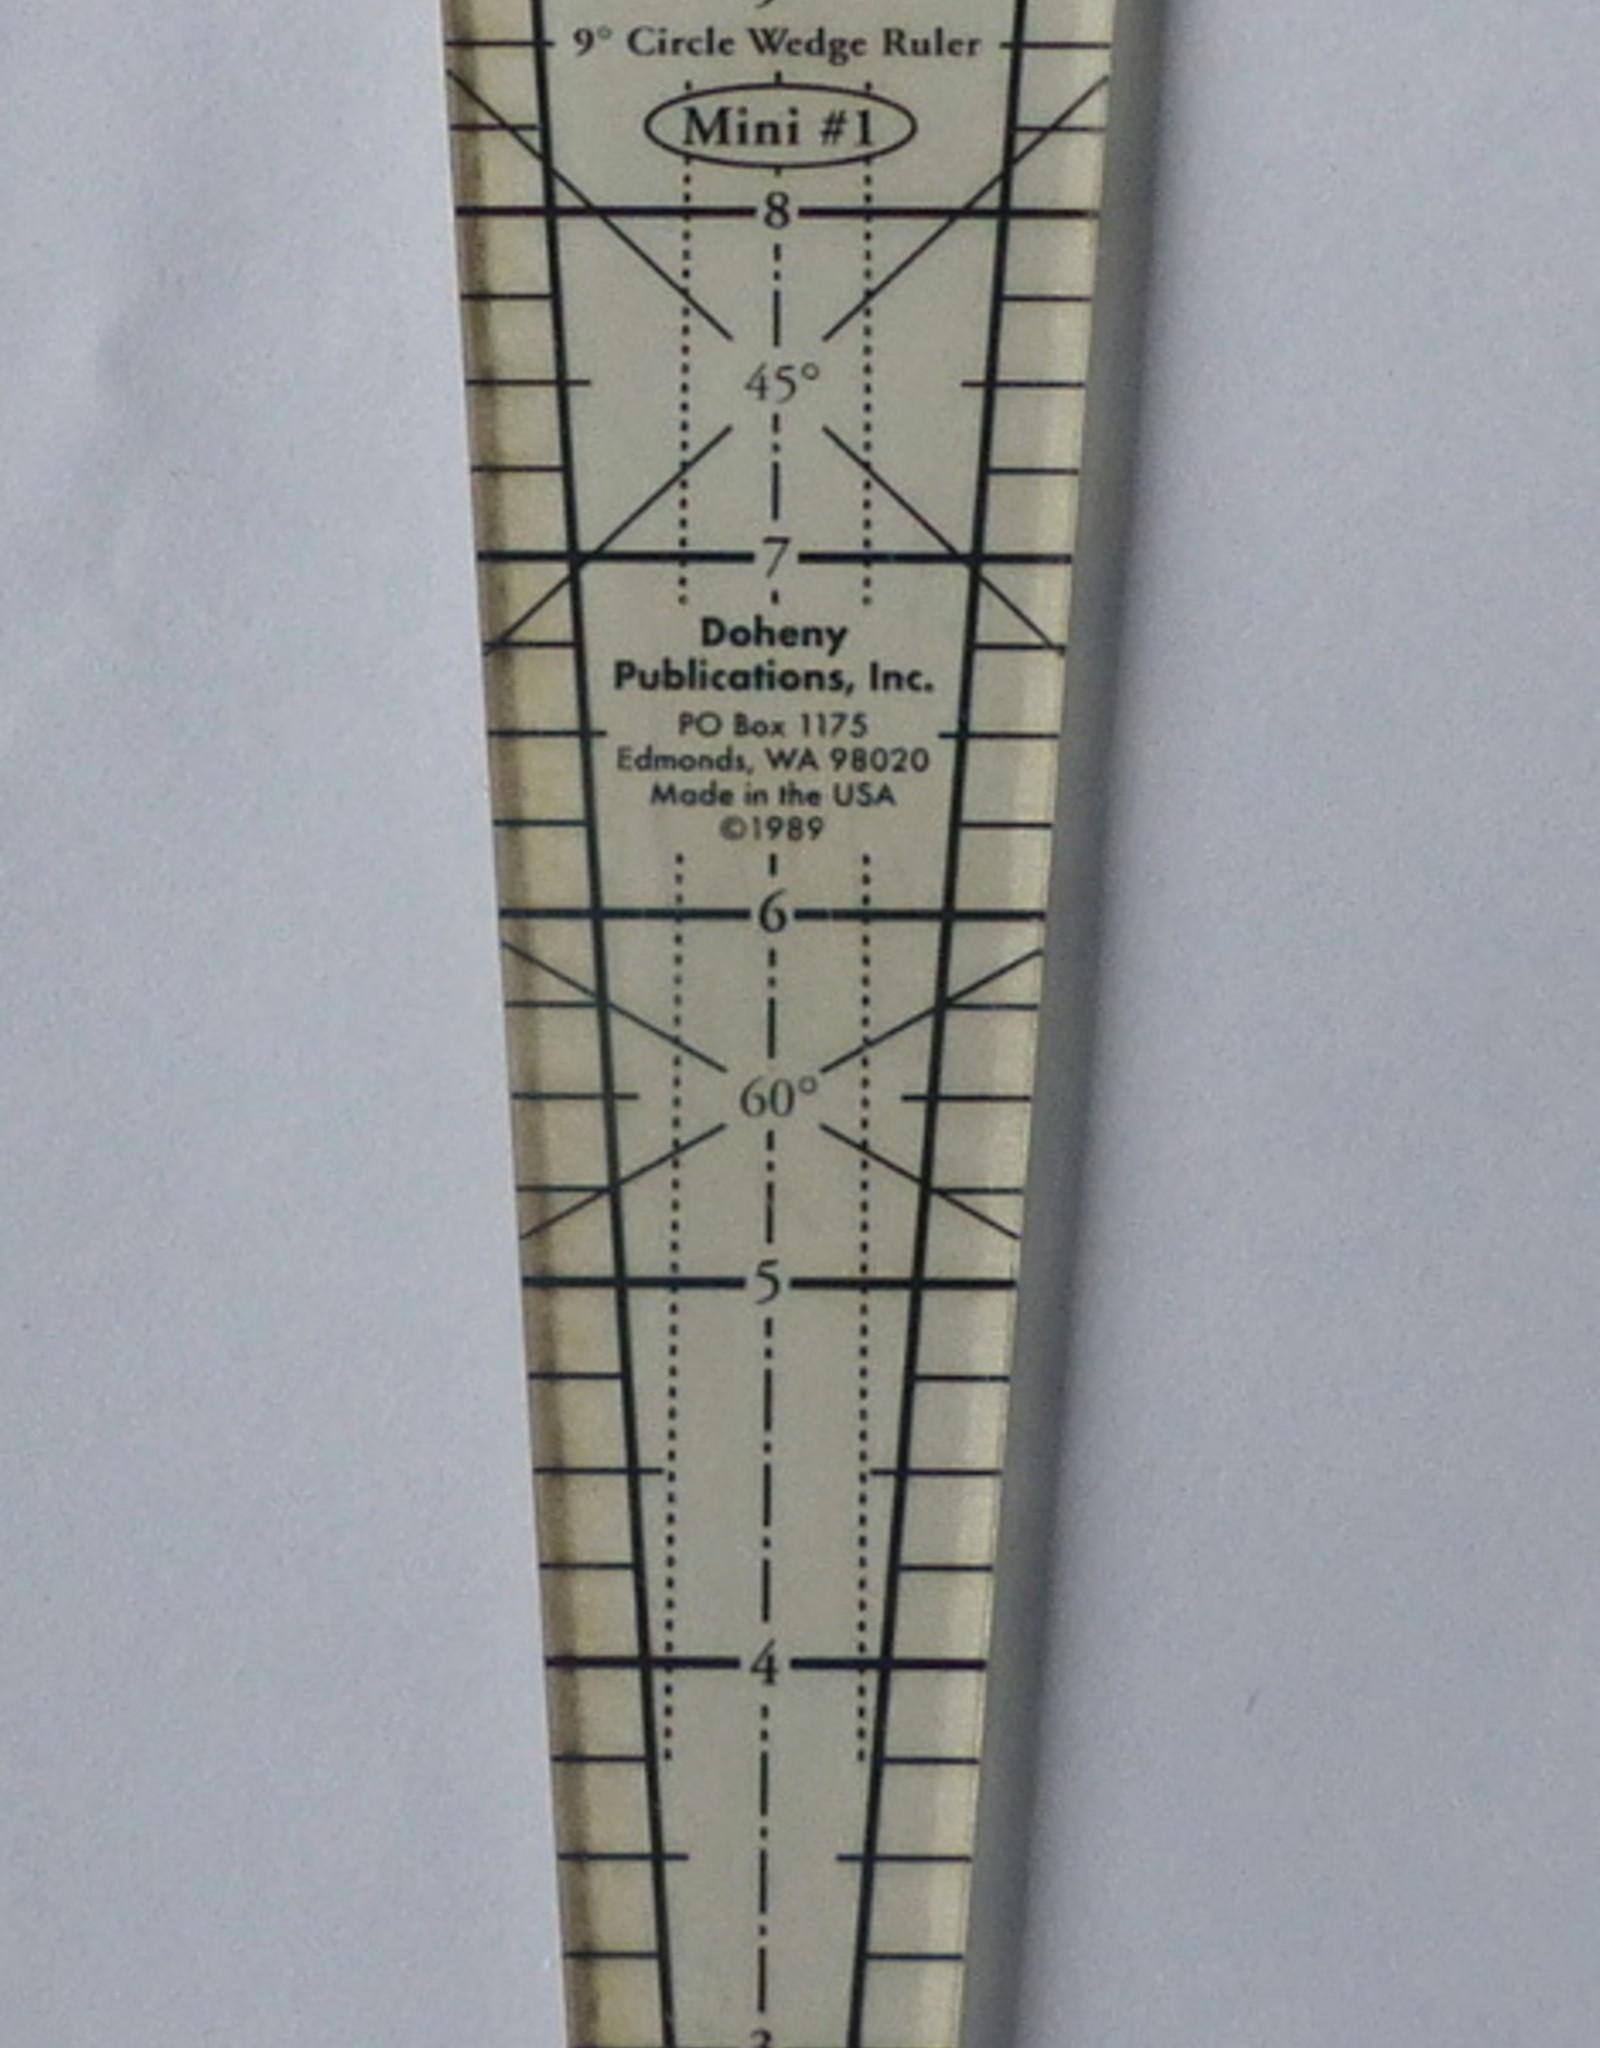 Marilyn Doheny 9 Grad Wedge Ruler